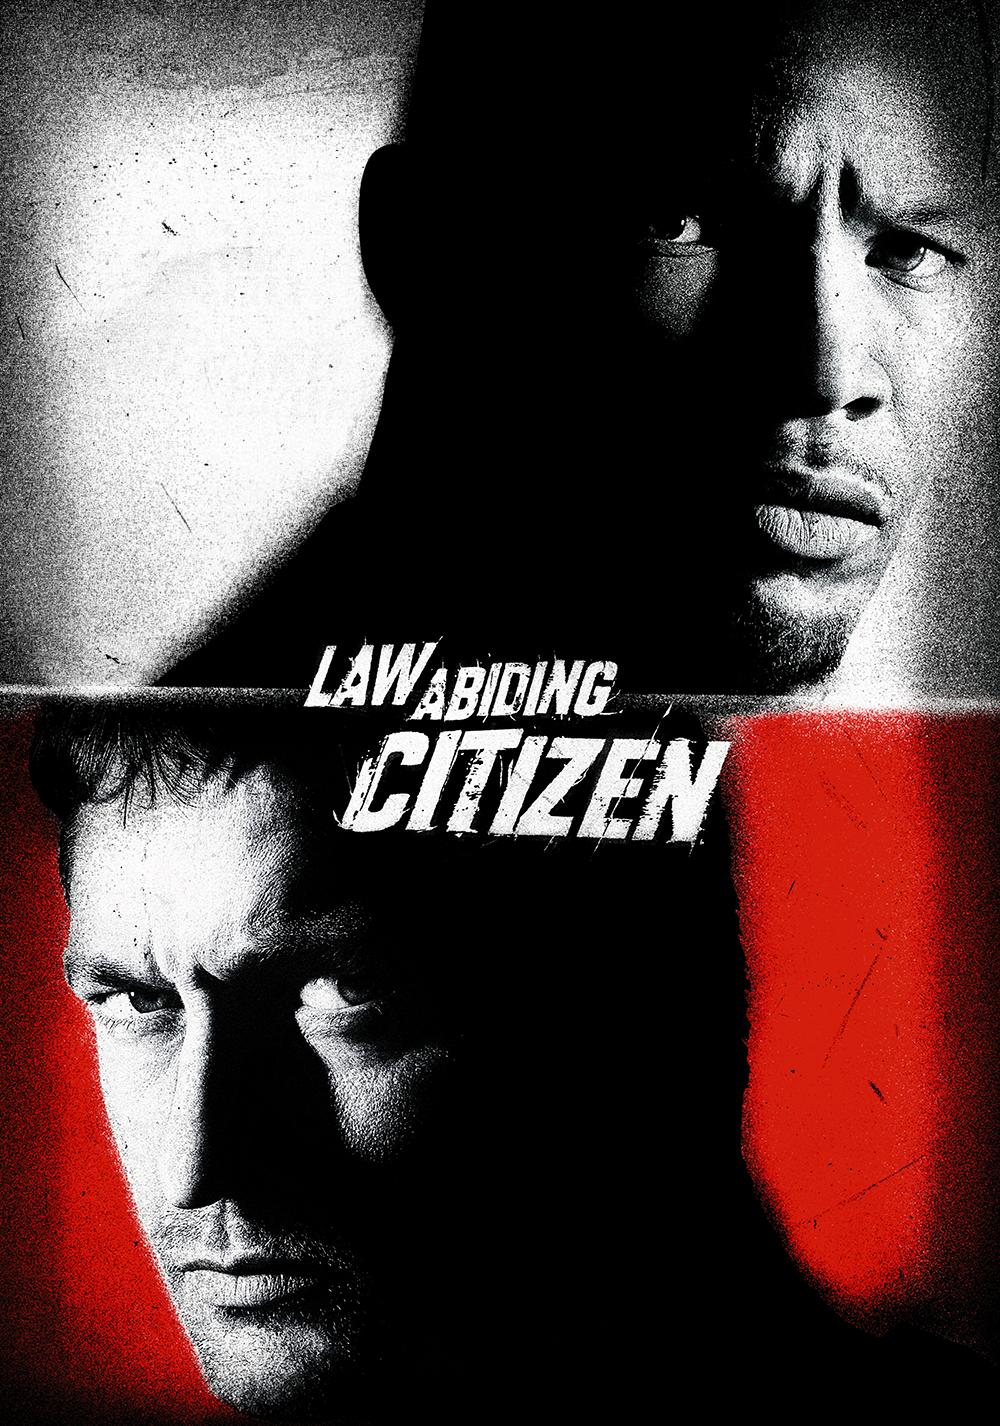 LAW ABIDING CITIZEN (2009) TAMIL DUBBED HD